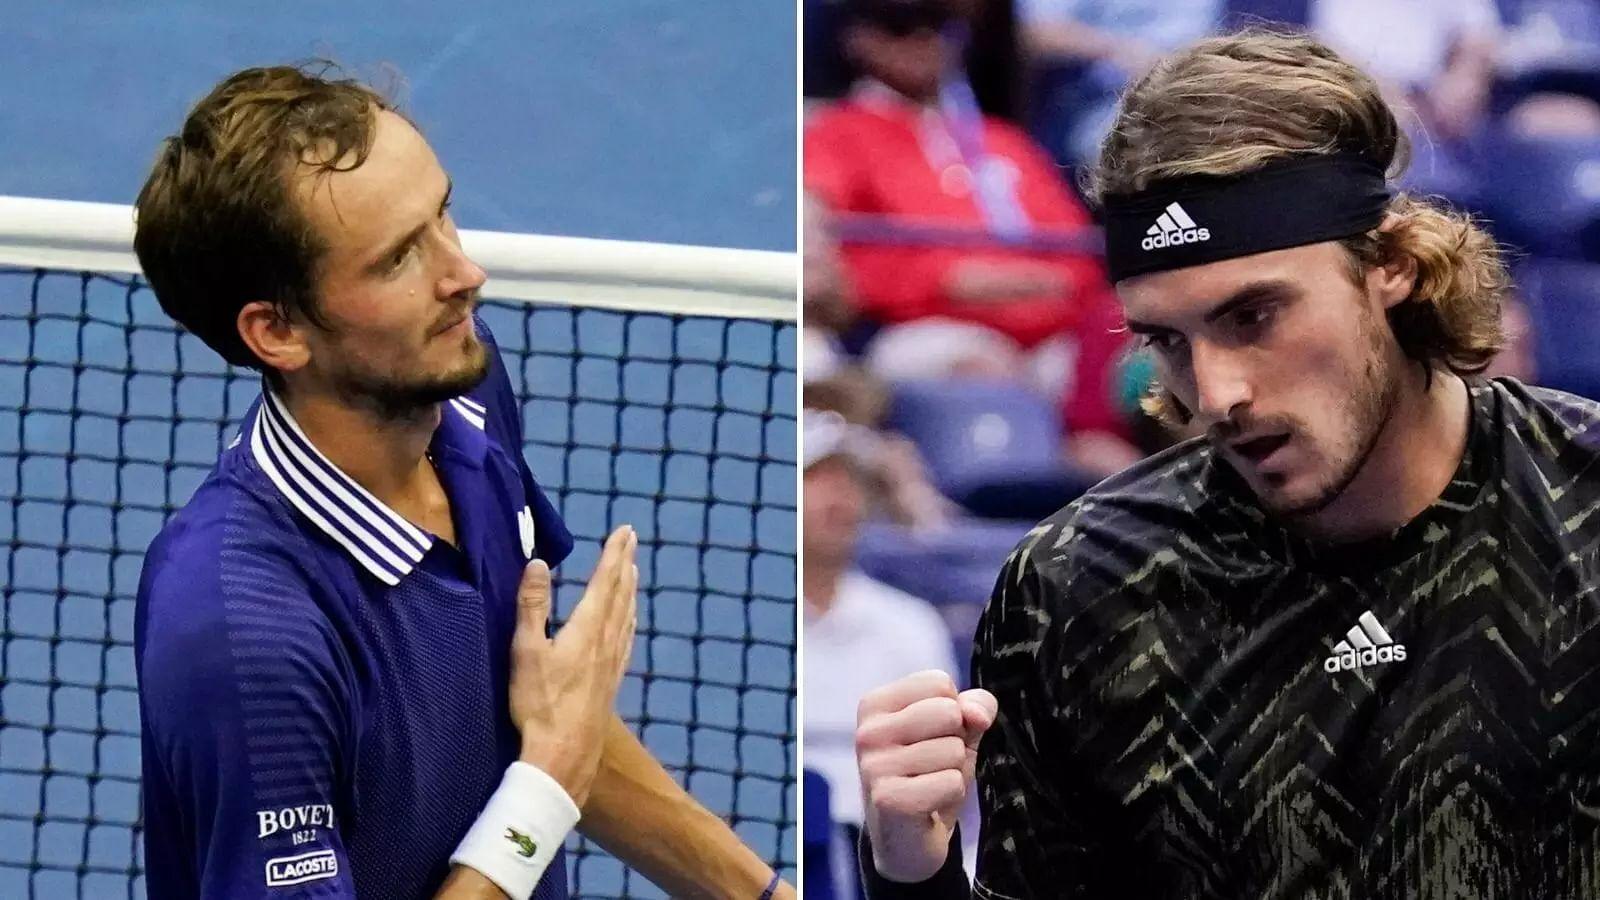 Daniil Medvedev and Greeces Stefanos Tsitsipas qualify for ATP Finals